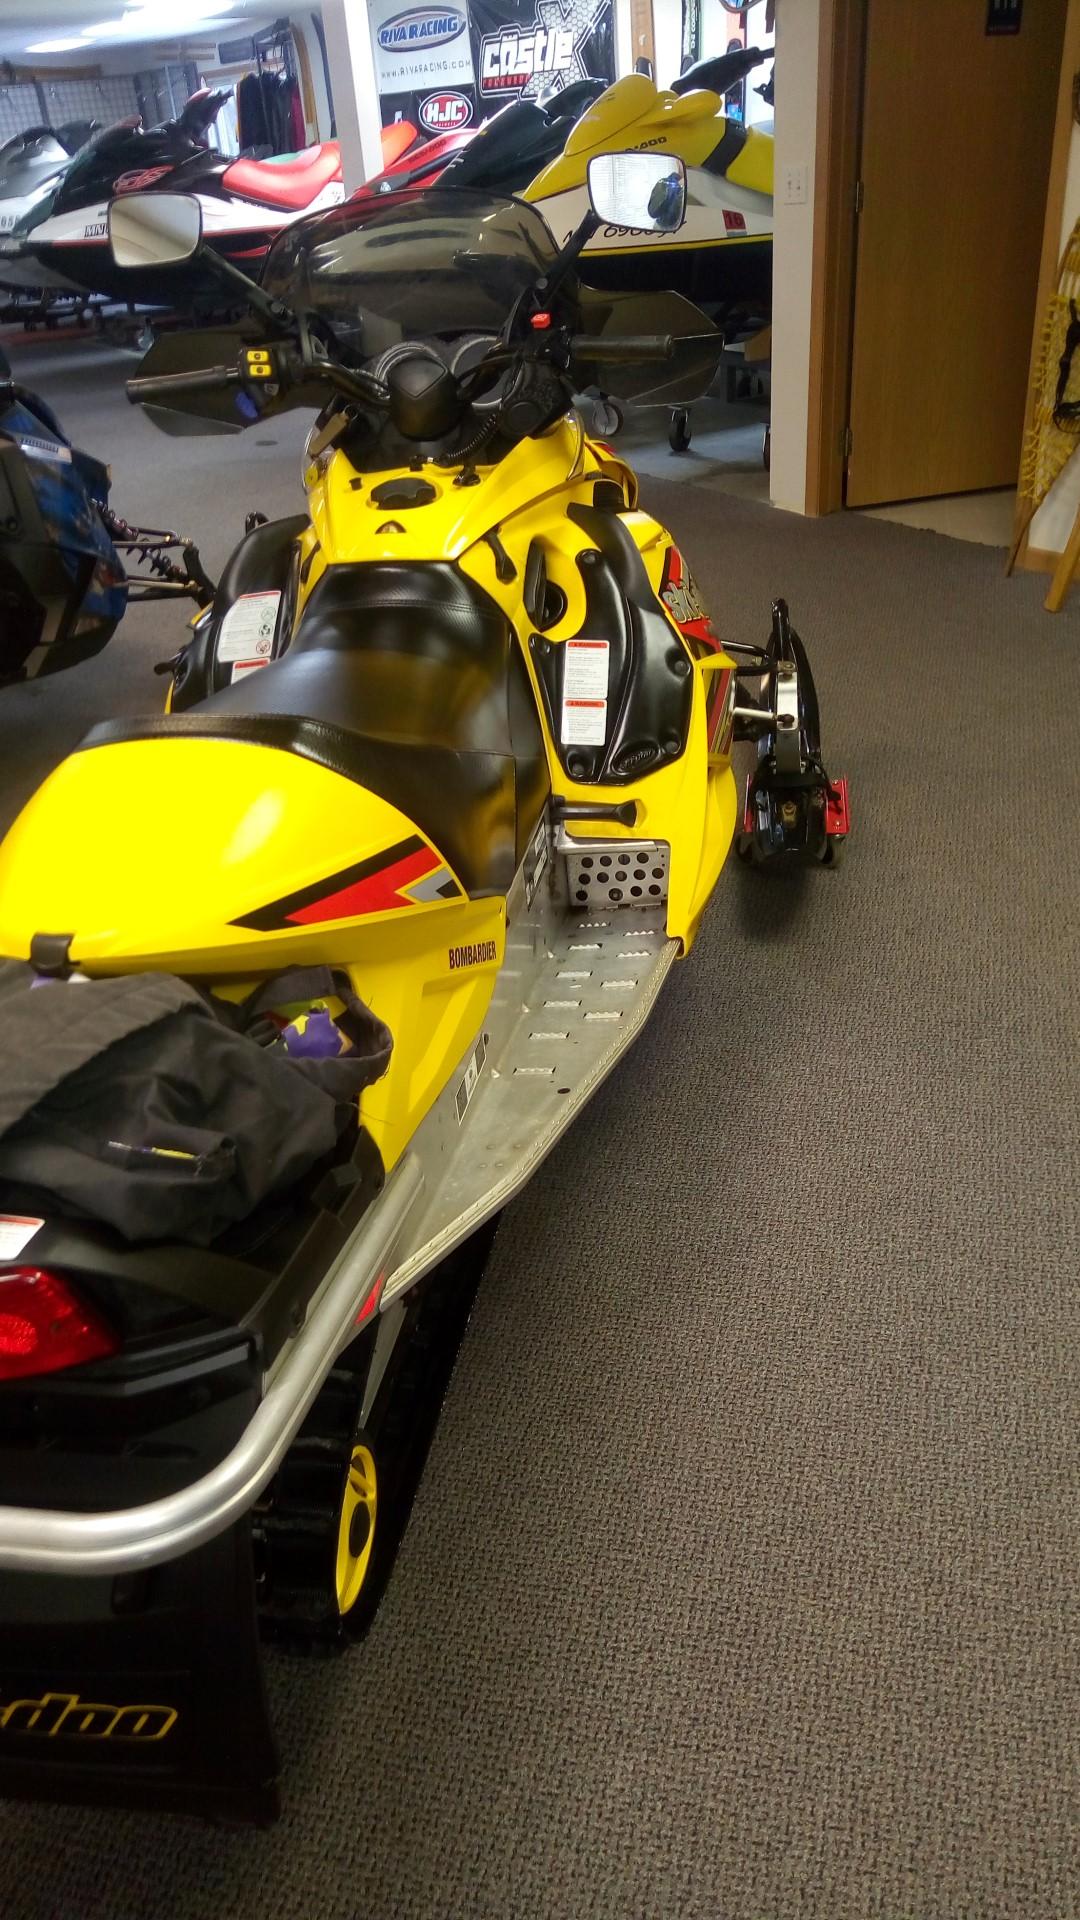 2005 Ski Doo MXZ 550f Seaberg Motorsports Crosslake MN Minnesota Twin Cities Maple Grove Minnetonka Plymouth Rear